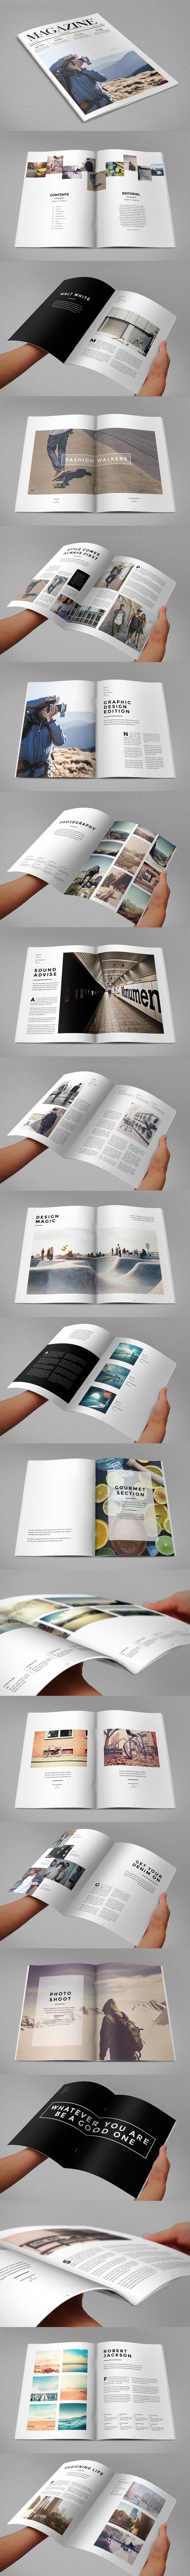 Minimal Style Magazine. Download here: http://graphicriver.net/item/minimal-style-magazine/8933496?ref=abradesign #design #mag #magazine